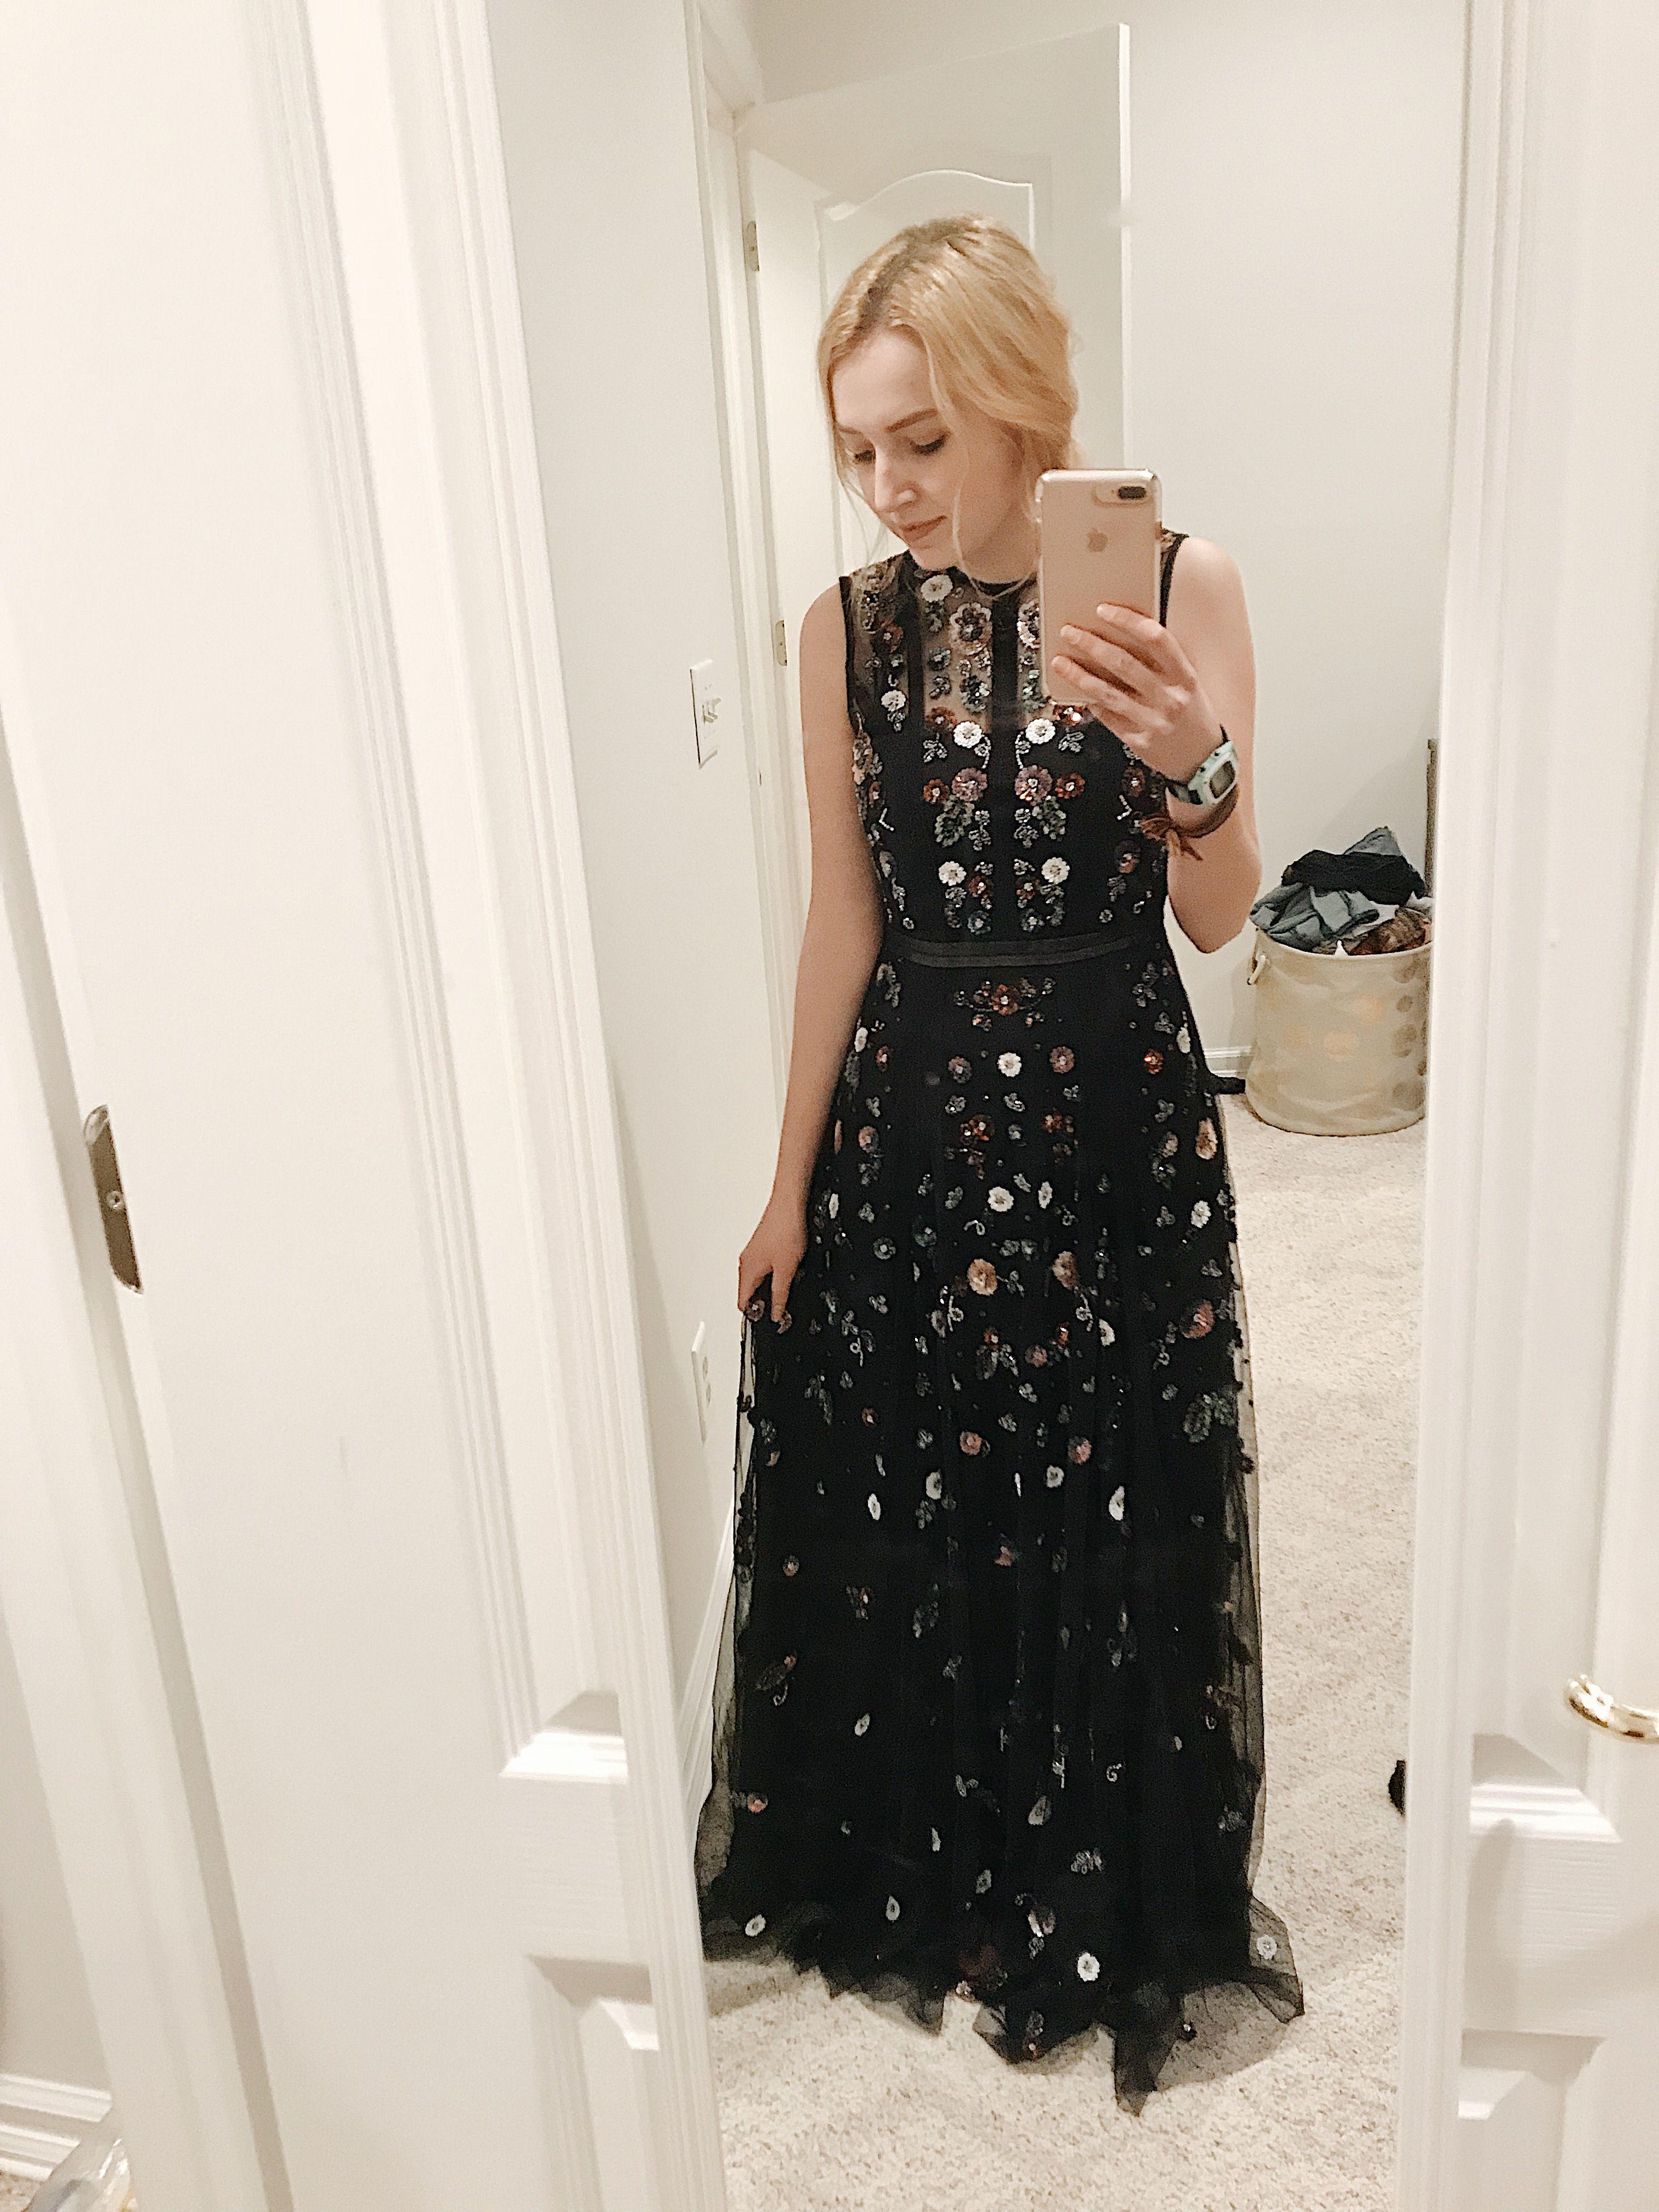 43da9b730872 Pin by maggie elizabeth reynolds🌿 on Prommmmmm | Formal dresses, Dresses,  Gowns